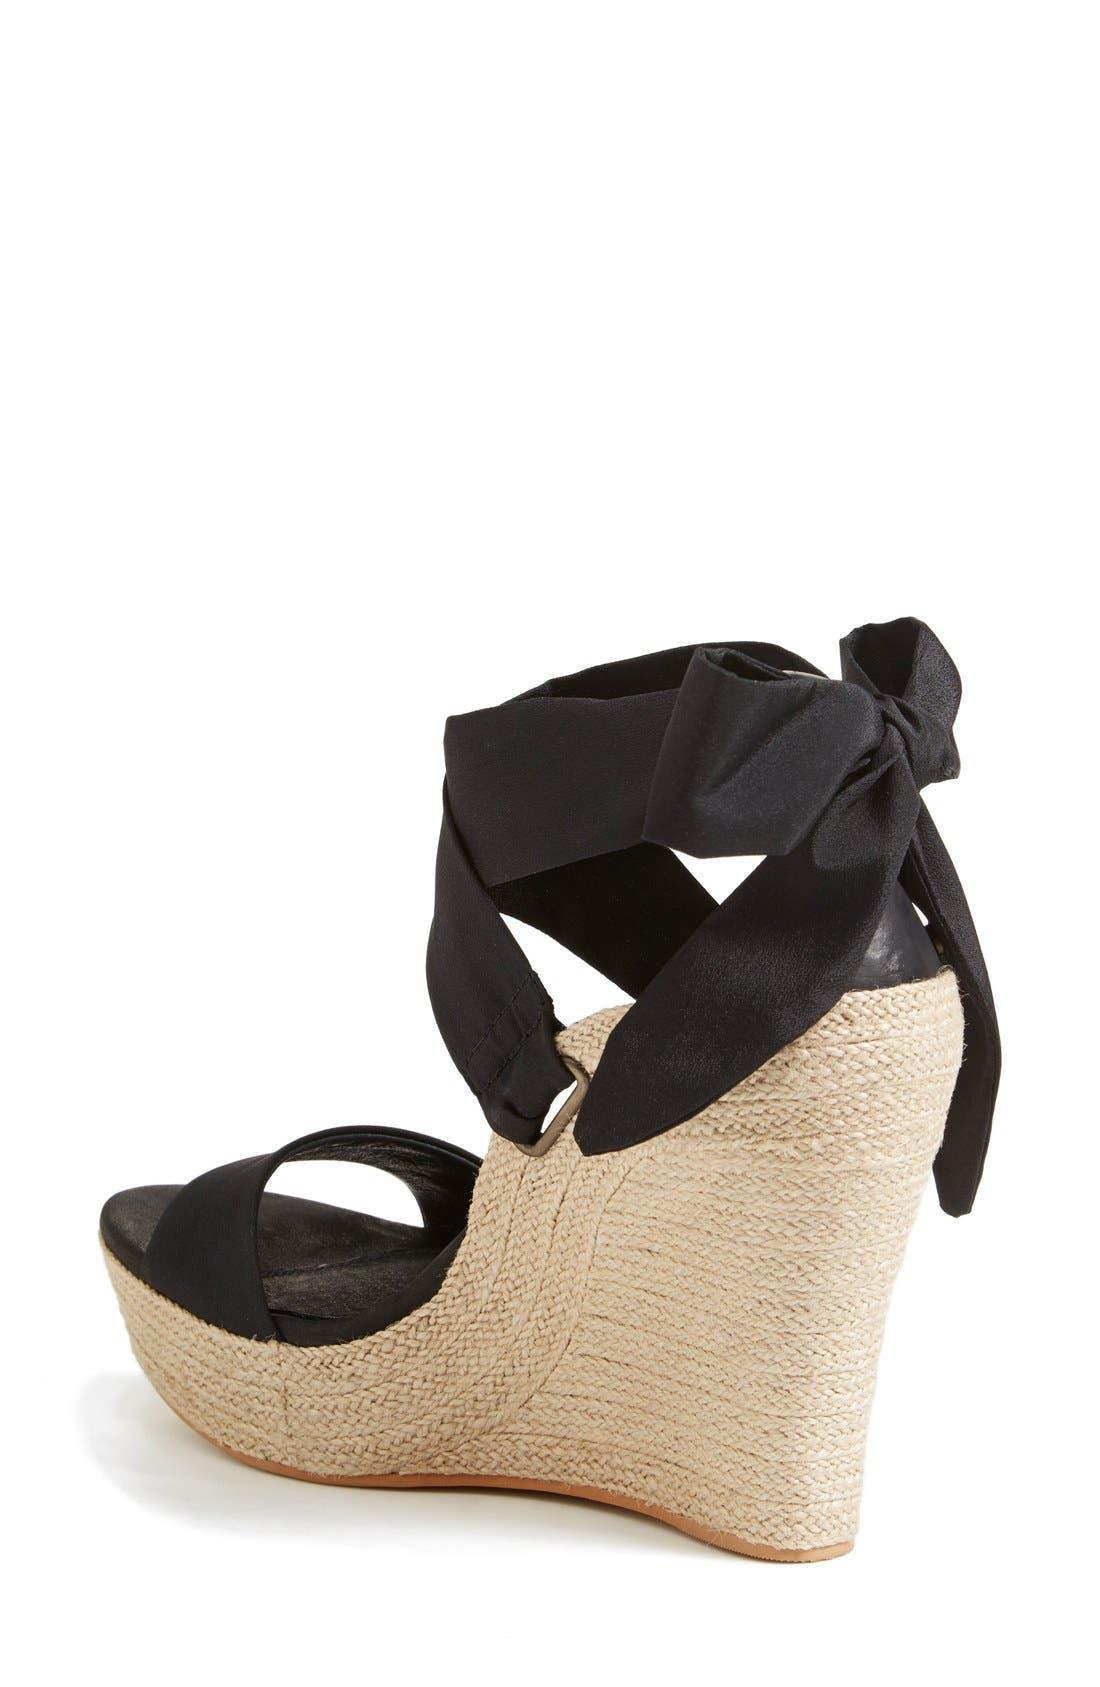 'Jules' Platform Wedge Sandal,                             Alternate thumbnail 2, color,                             Black